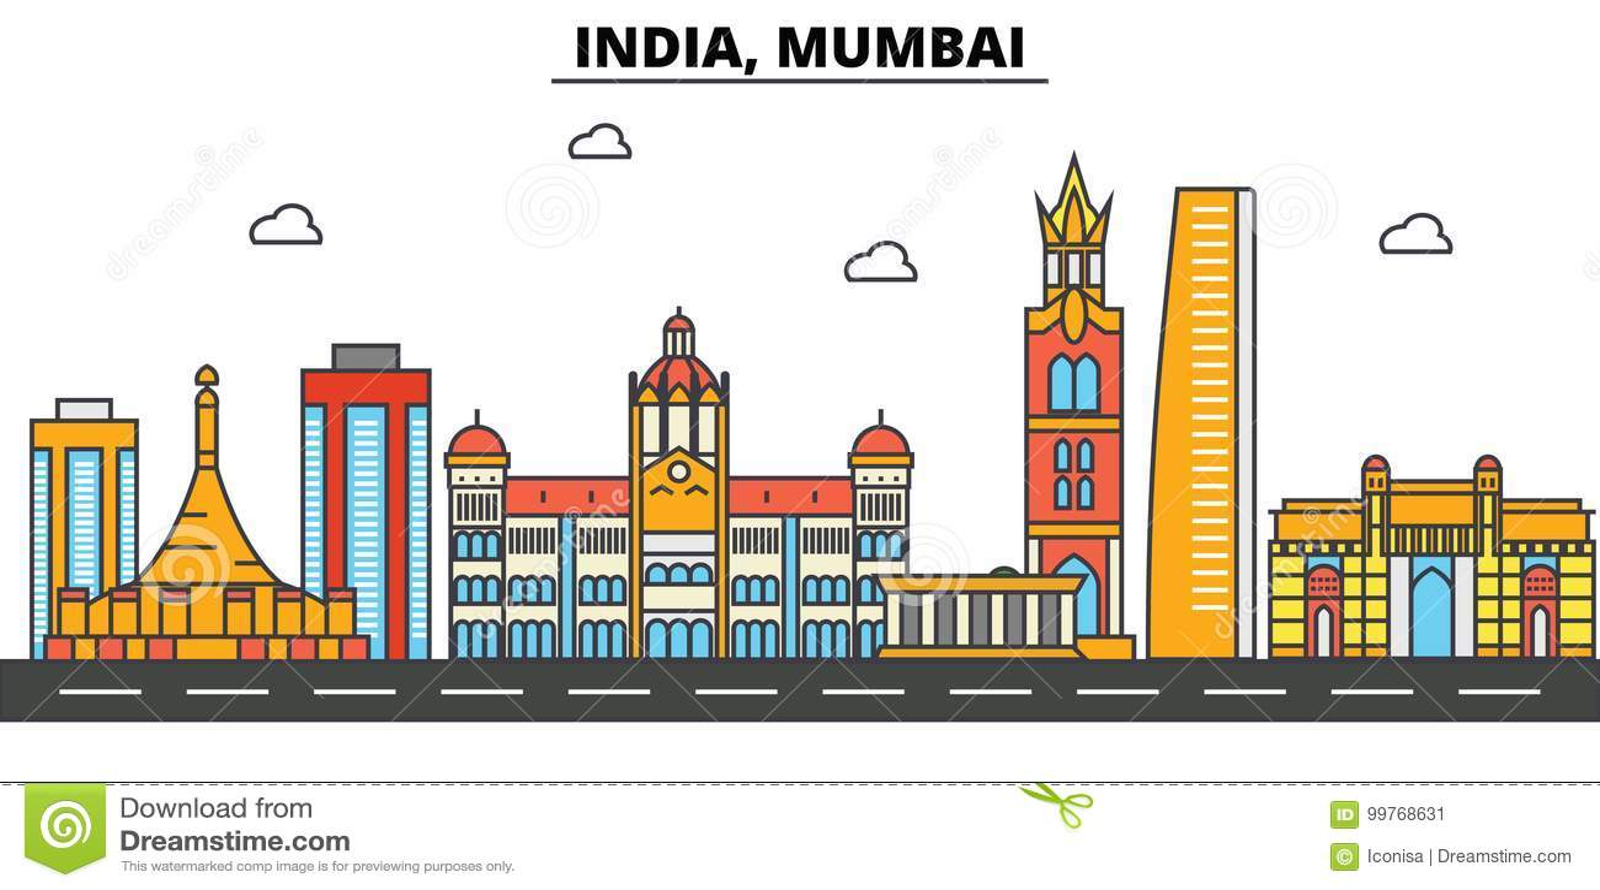 India, Mumbai De architectuur van de stadshorizon editable